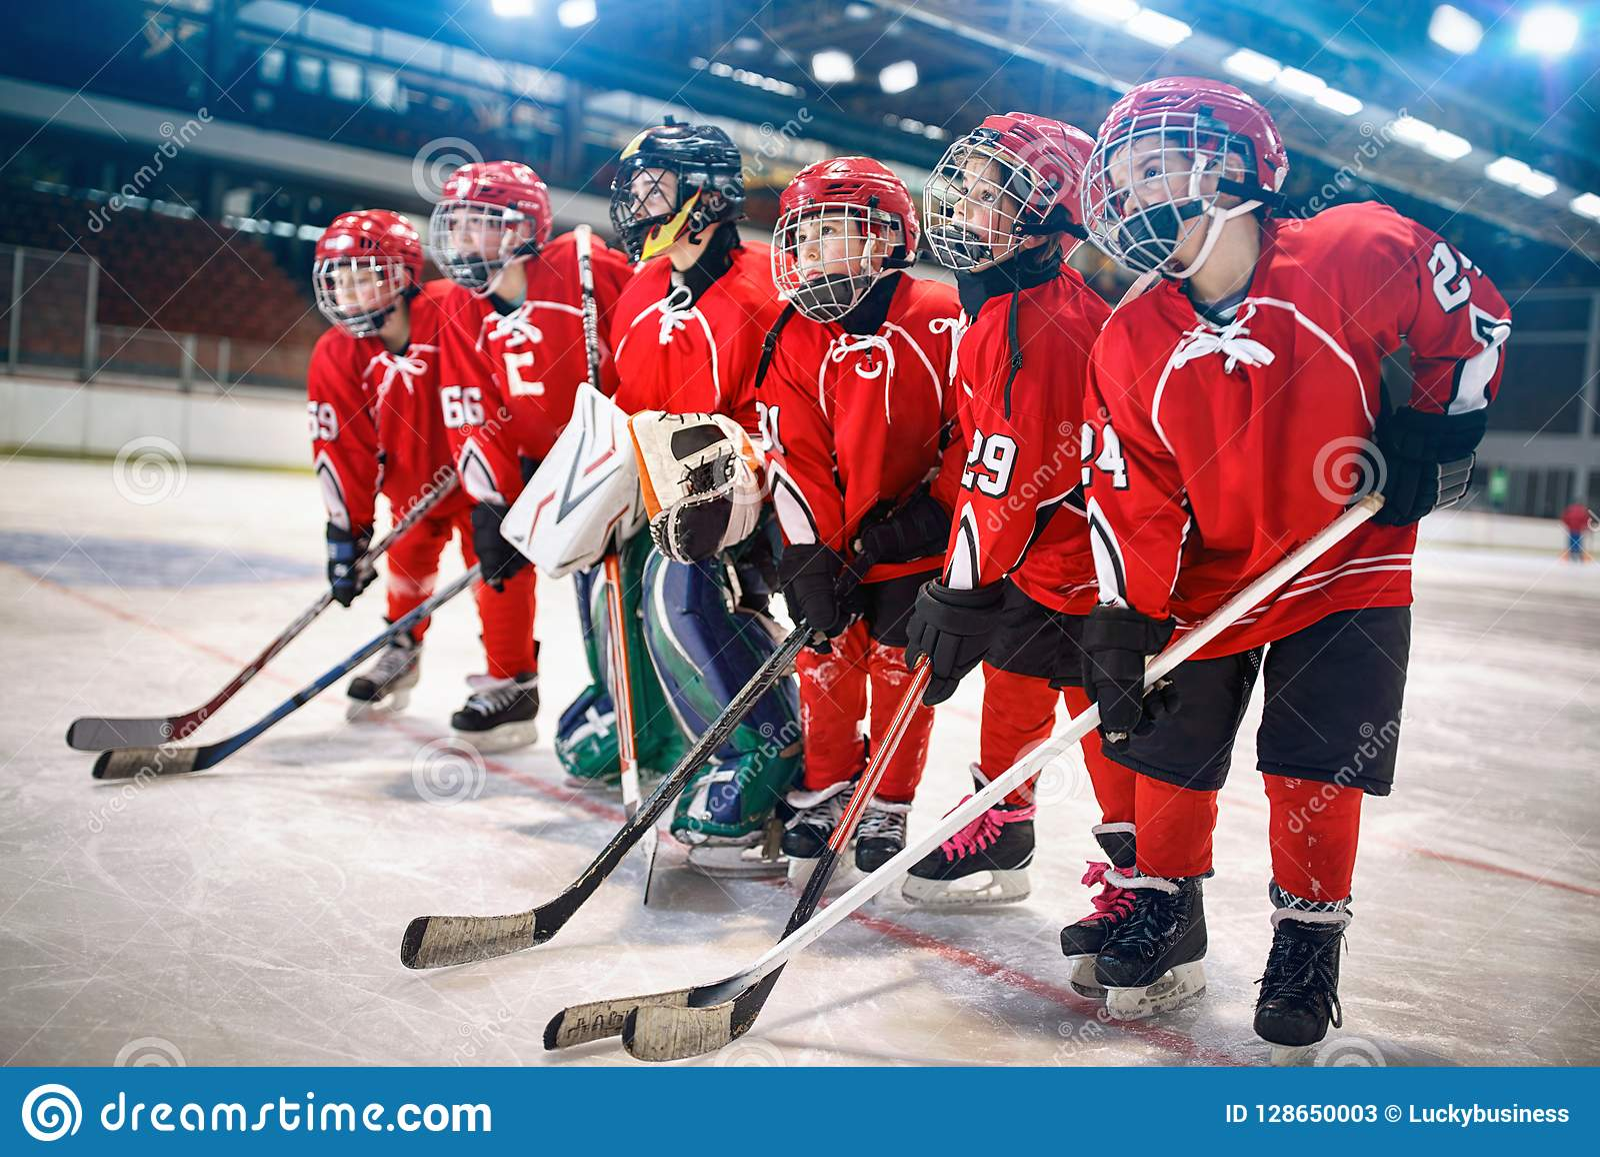 Young hockey team - children play hockey